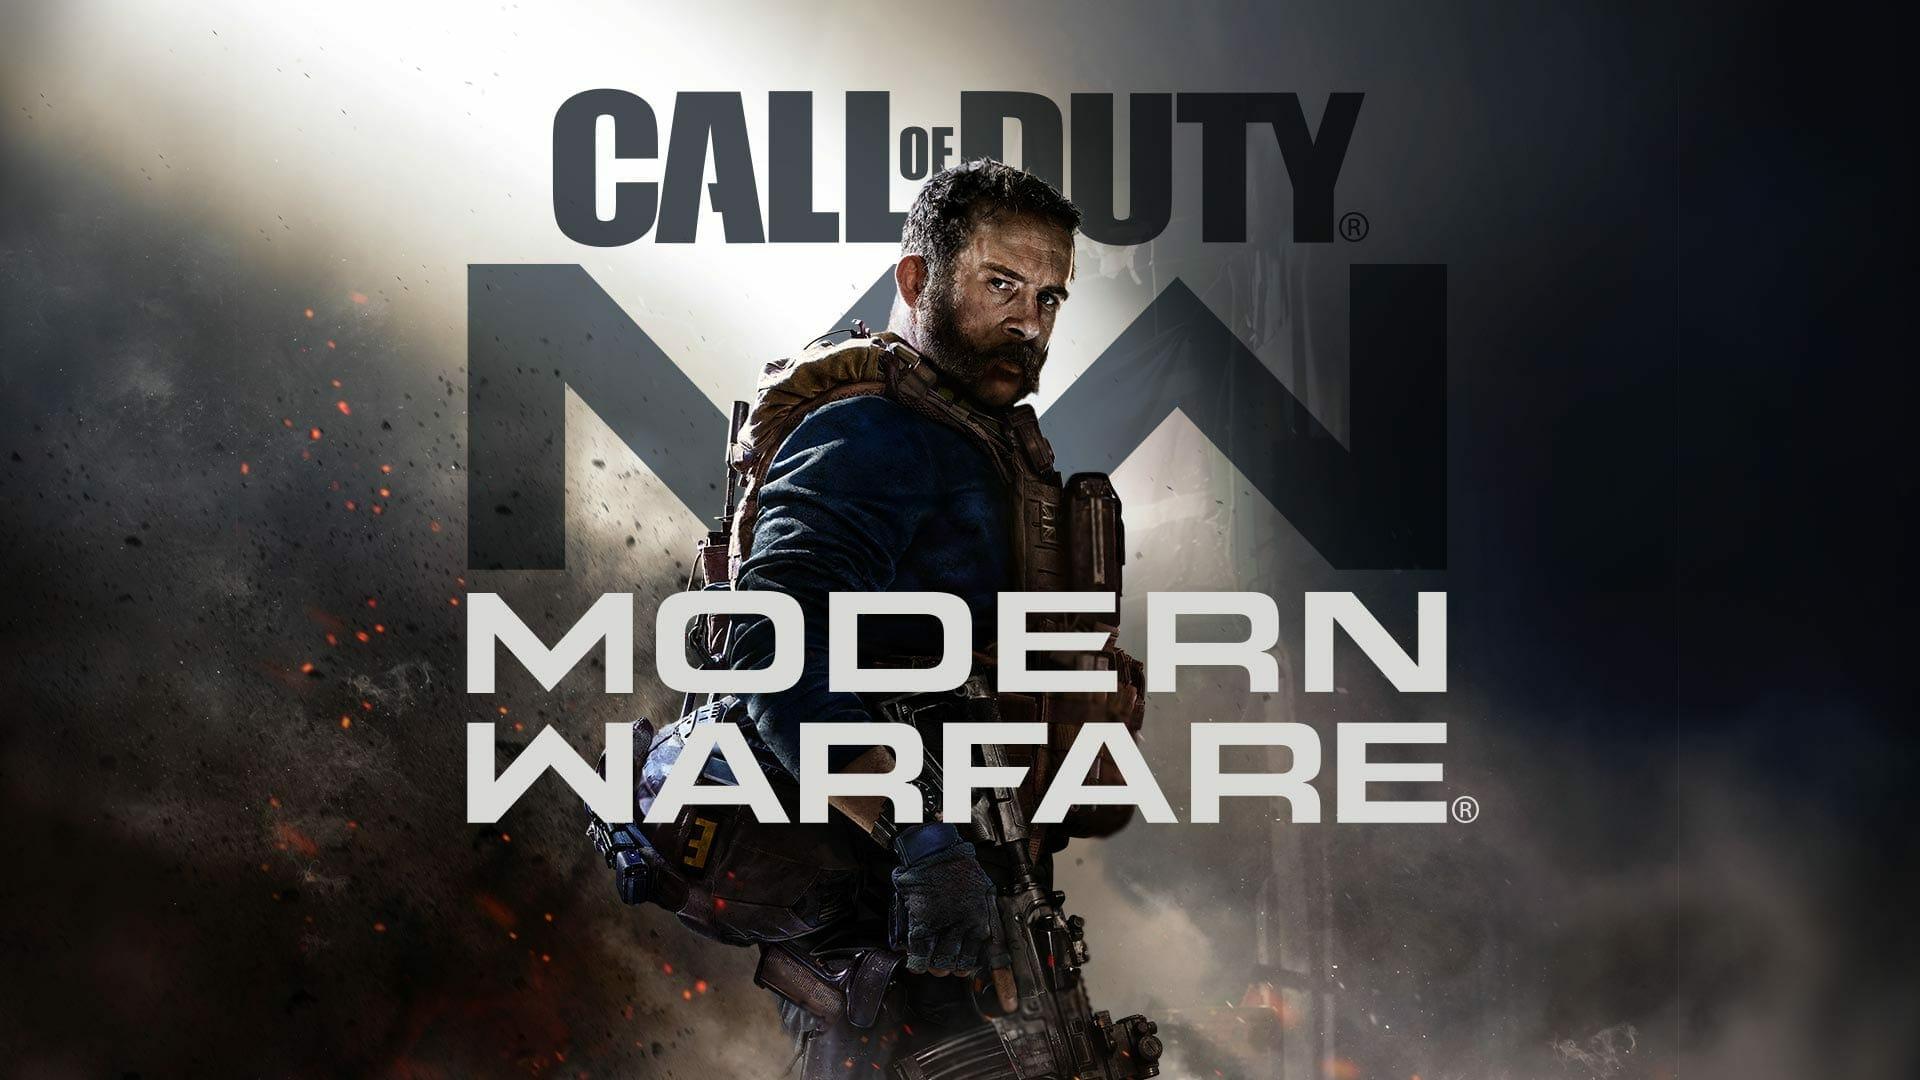 Reduce Call of Duty: Modern Warfare size